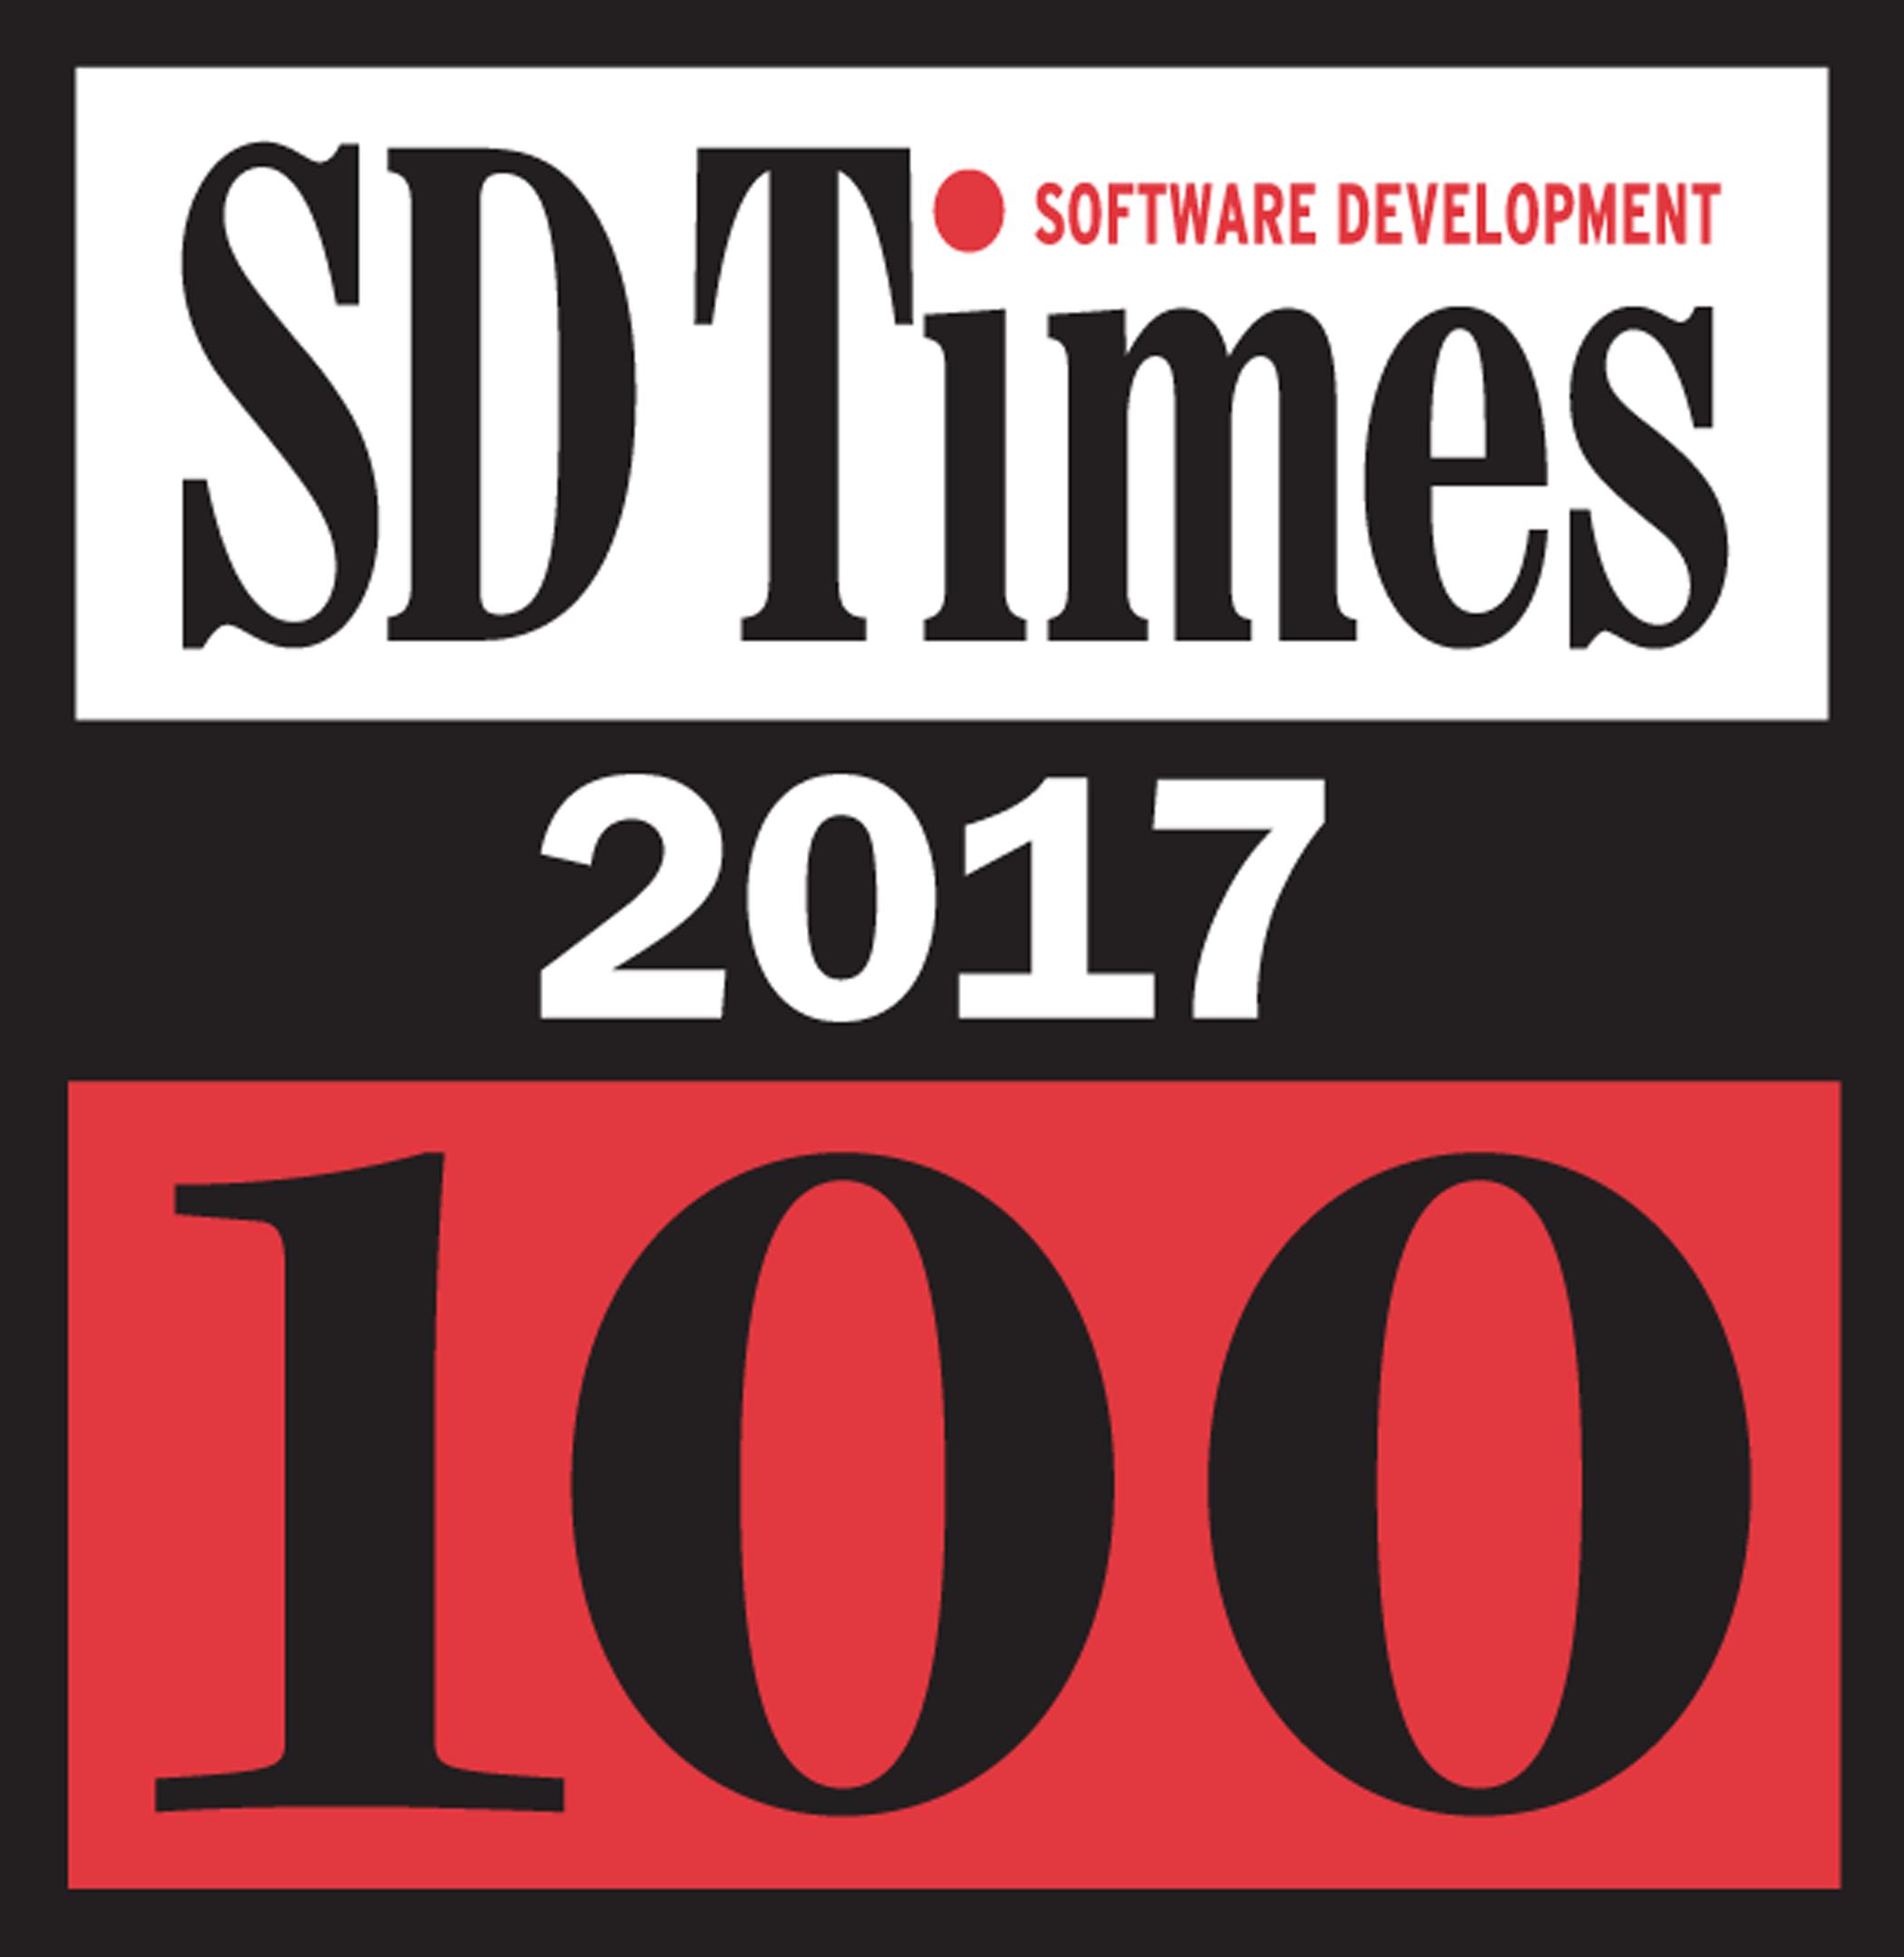 DeployHub Receives SDTimes 100 Award